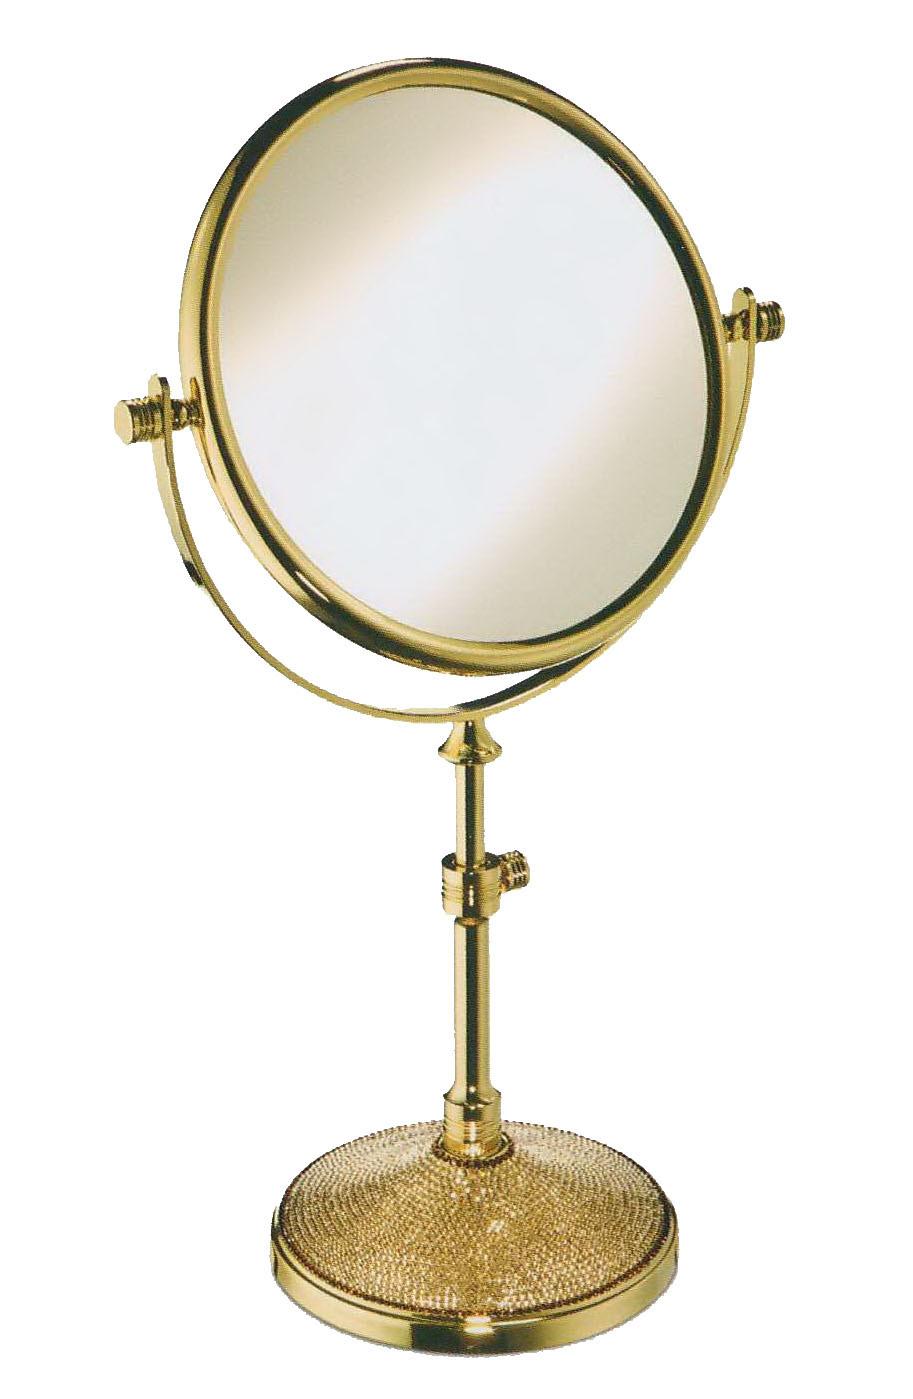 Зеркала Элитное зеркало косметическое 99532O 5X Starlight от Windisch elitnoe-zerkalo-kosmeticheskoe-99532o-3x-starlight-ot-windisch-ispaniya.jpg